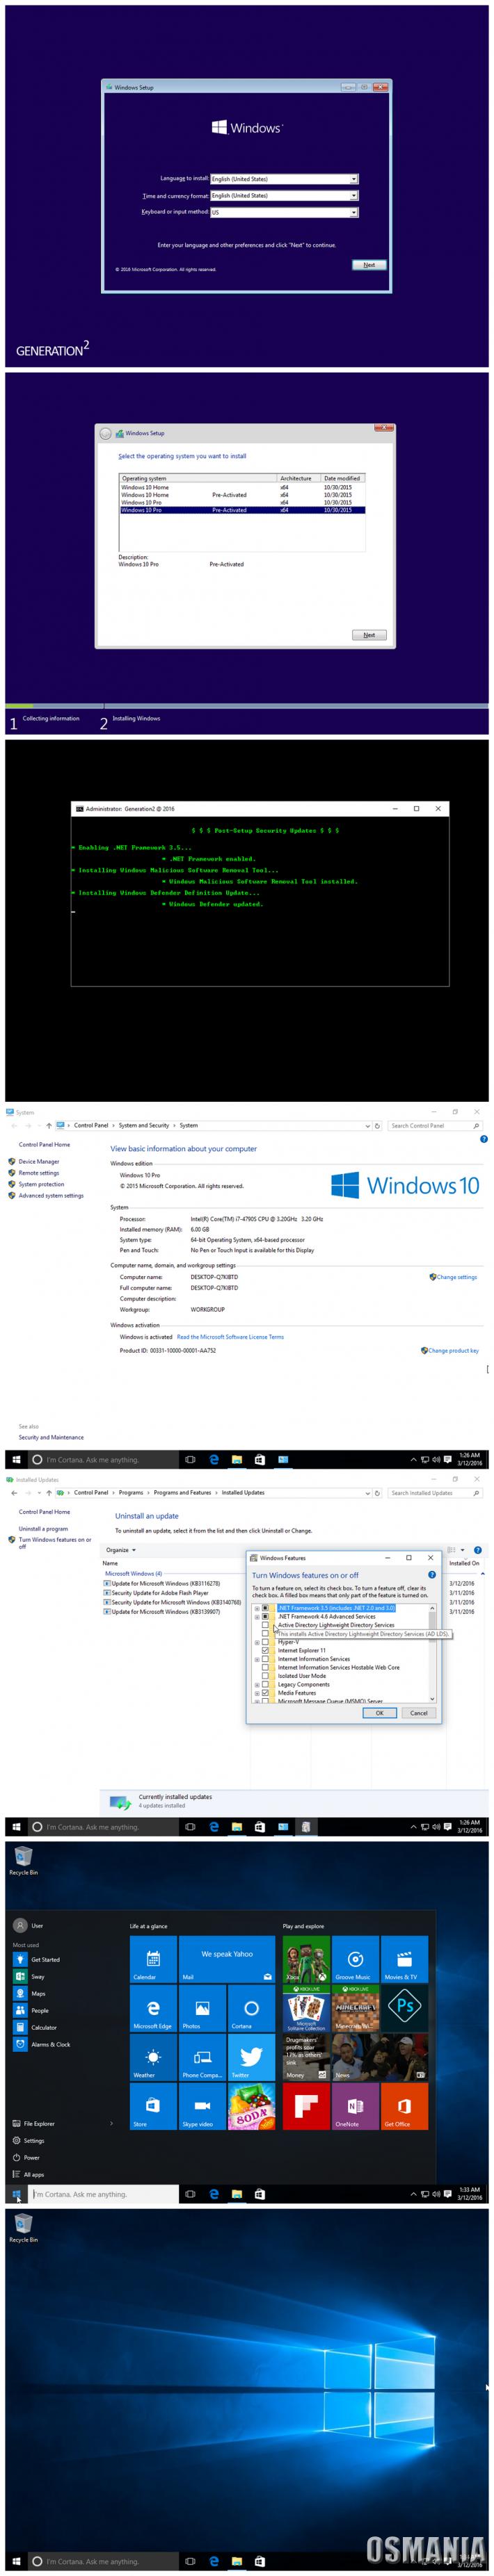 x64] Windows 10 Home Pro v1511 en-US 2016-03 by Generation2 > Windows